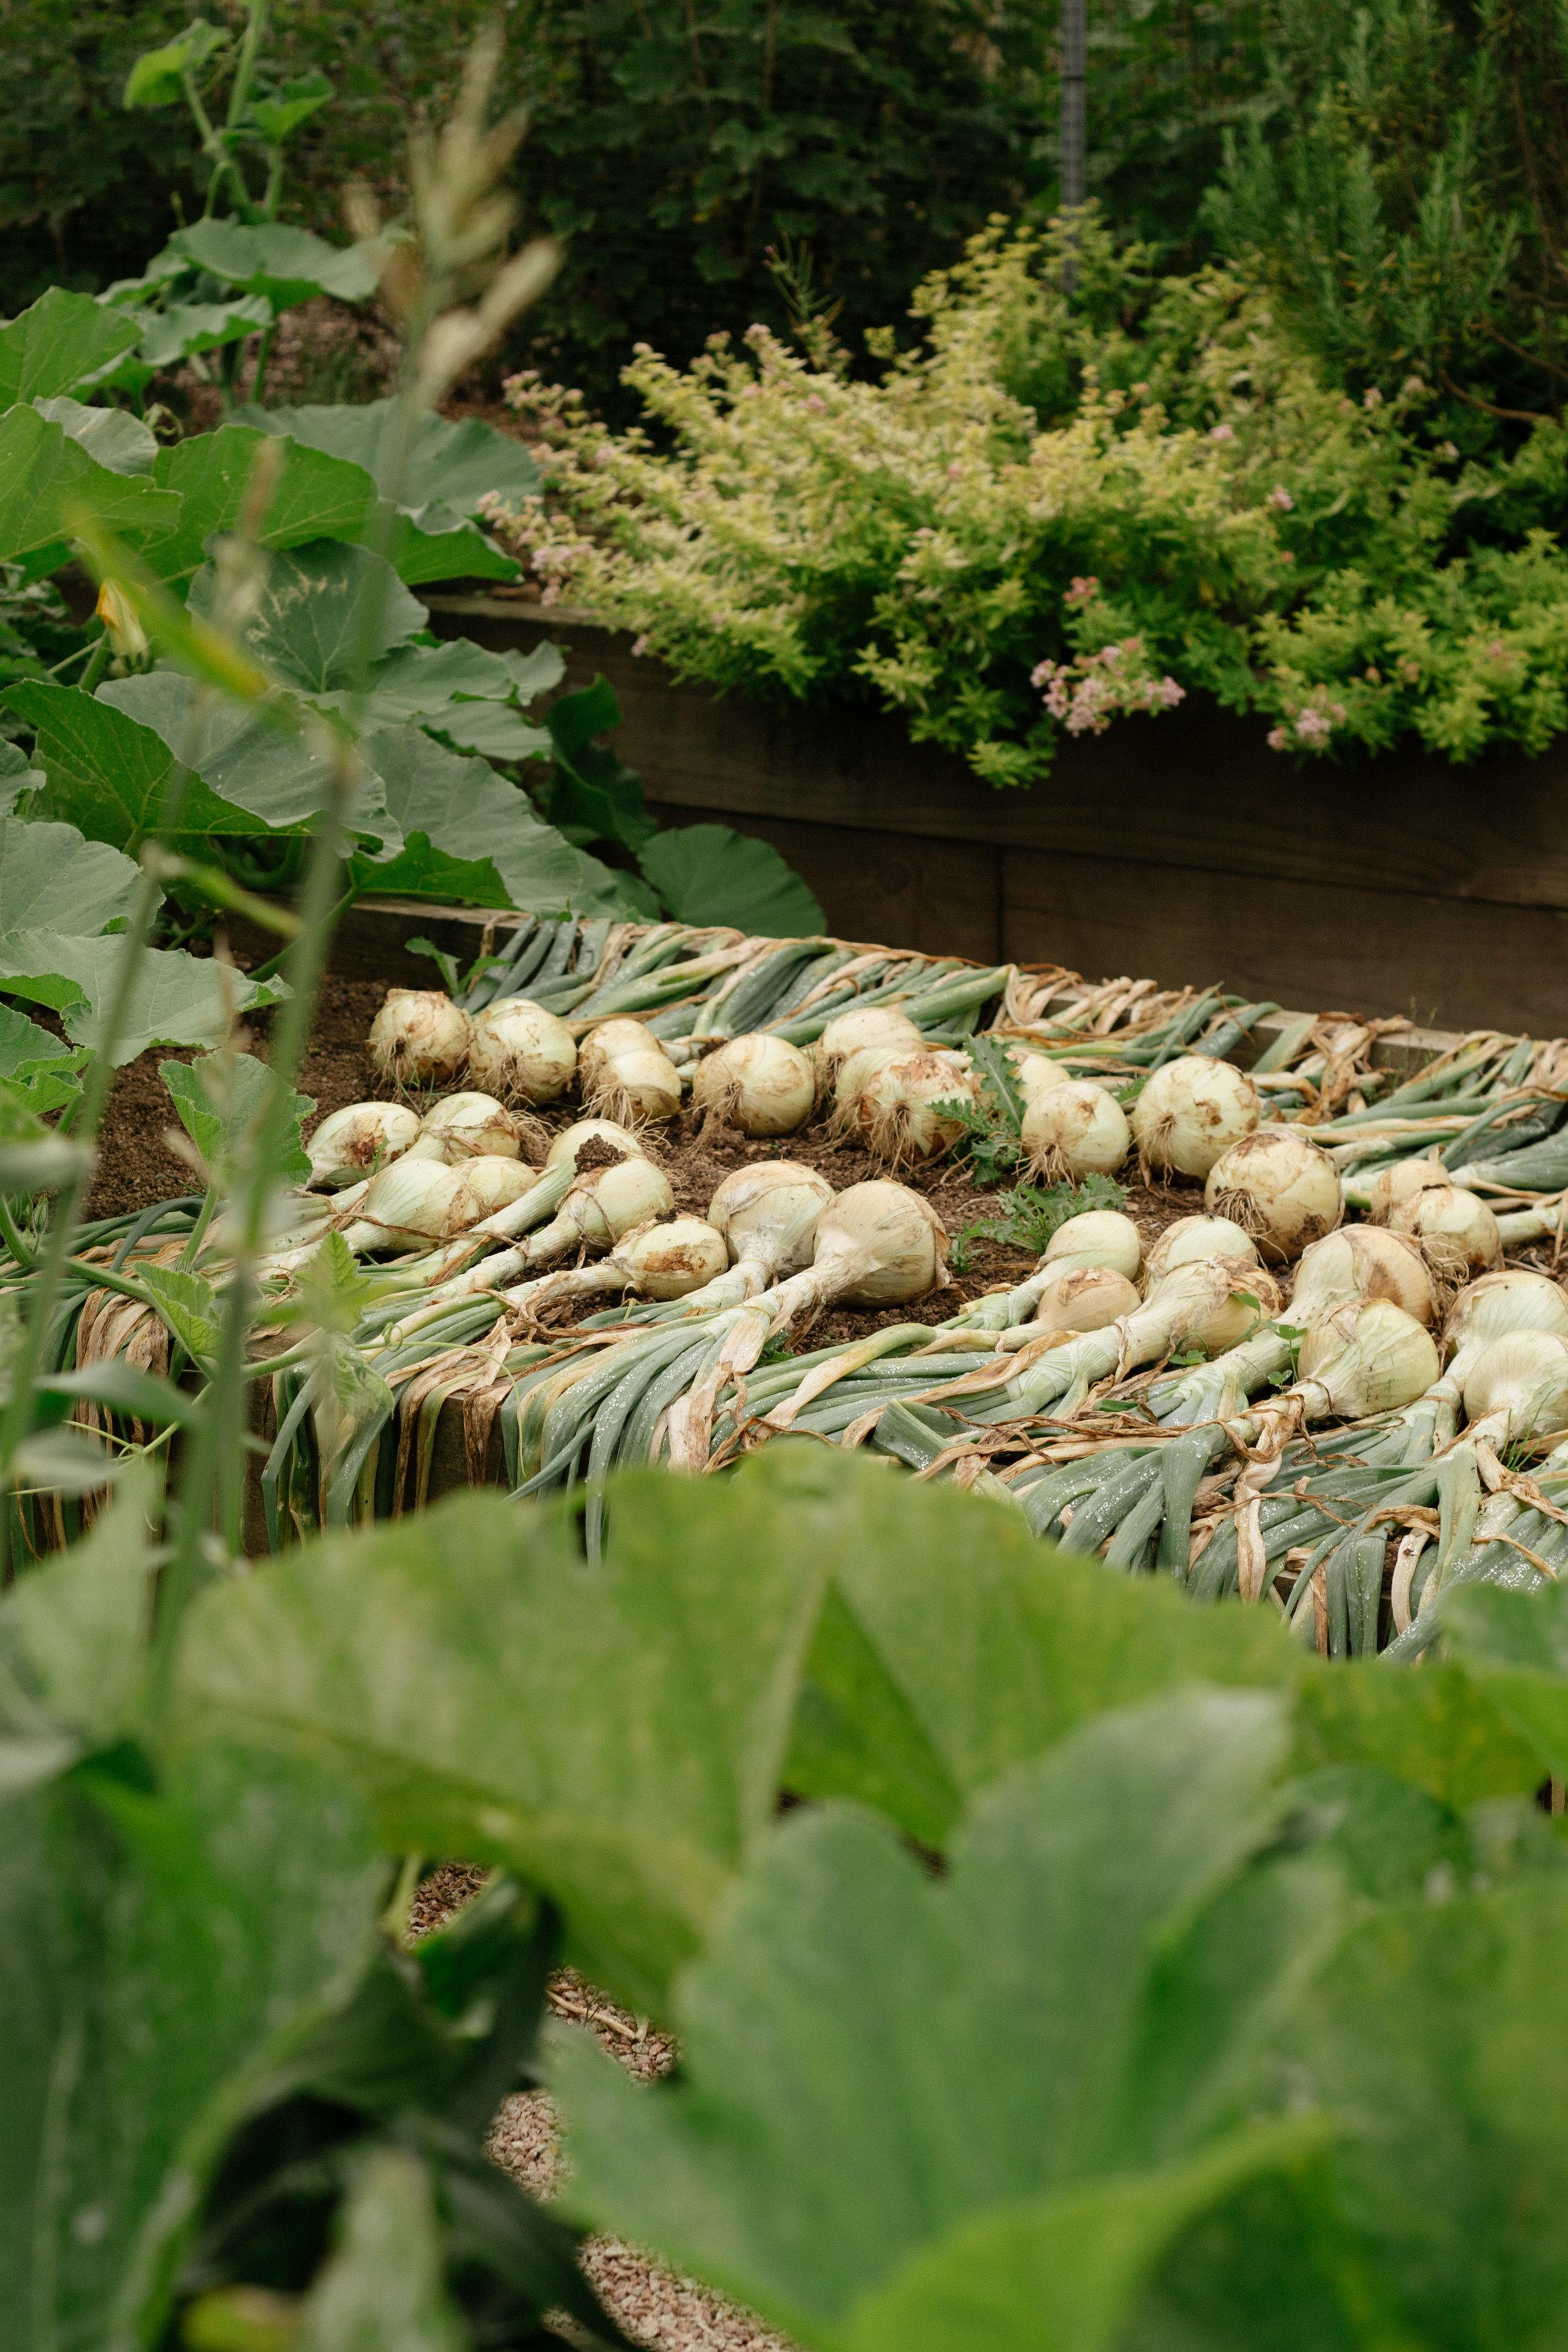 Onion bulbs drying in the sun.